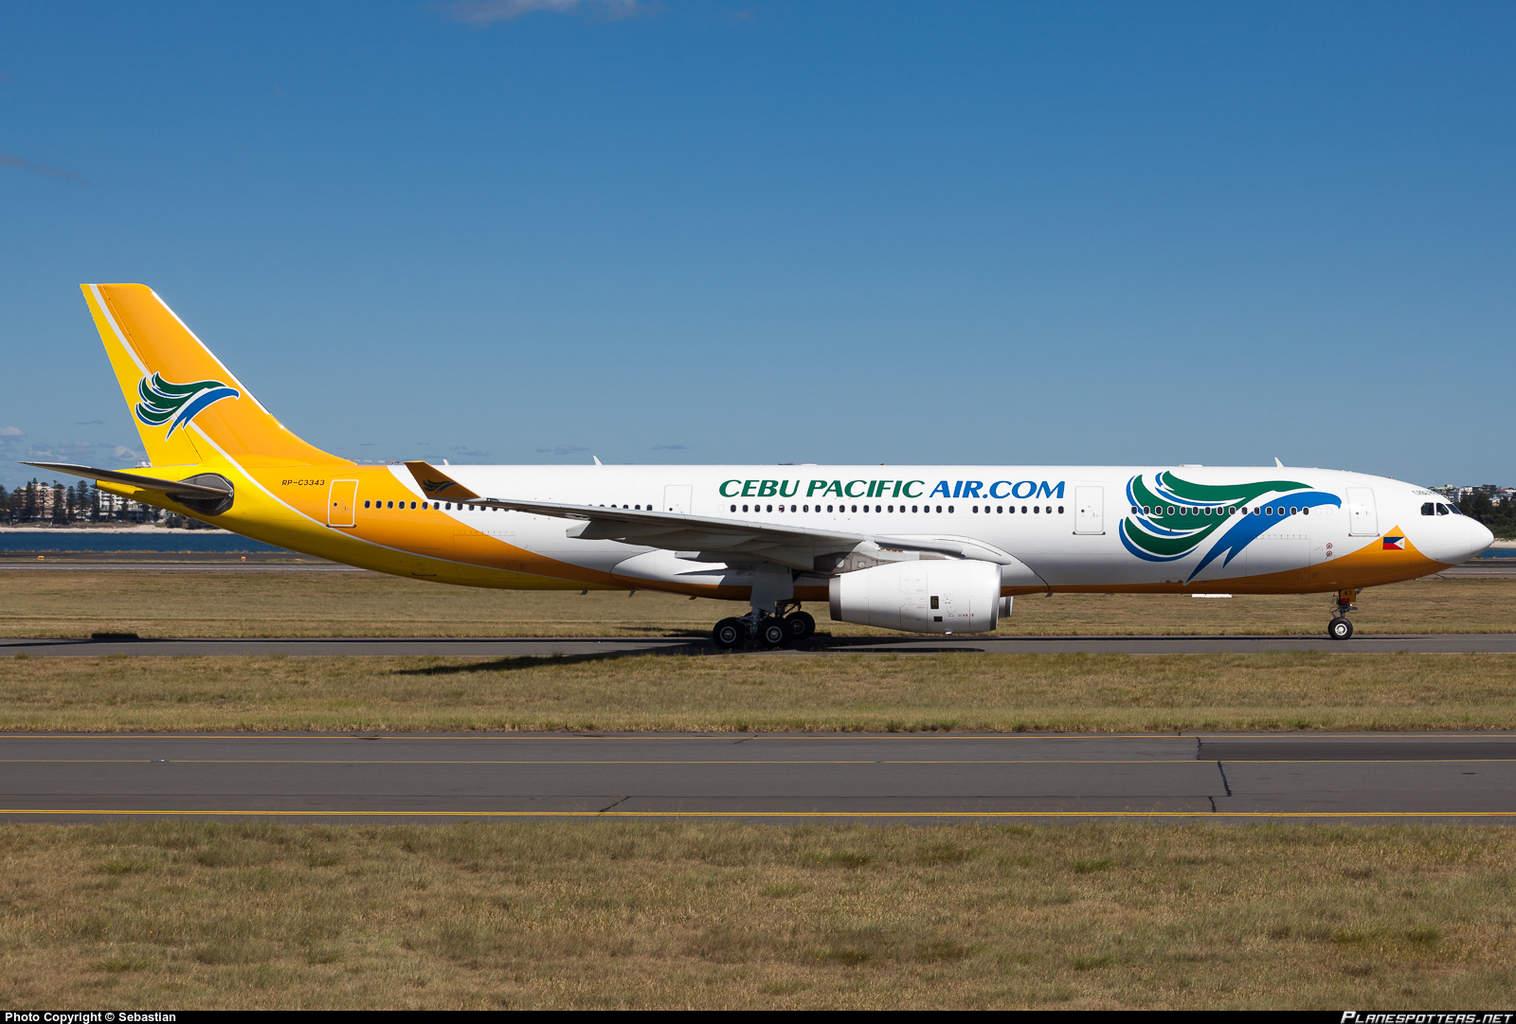 Cebu Pacific Air Airbus A330-343 has engine problem